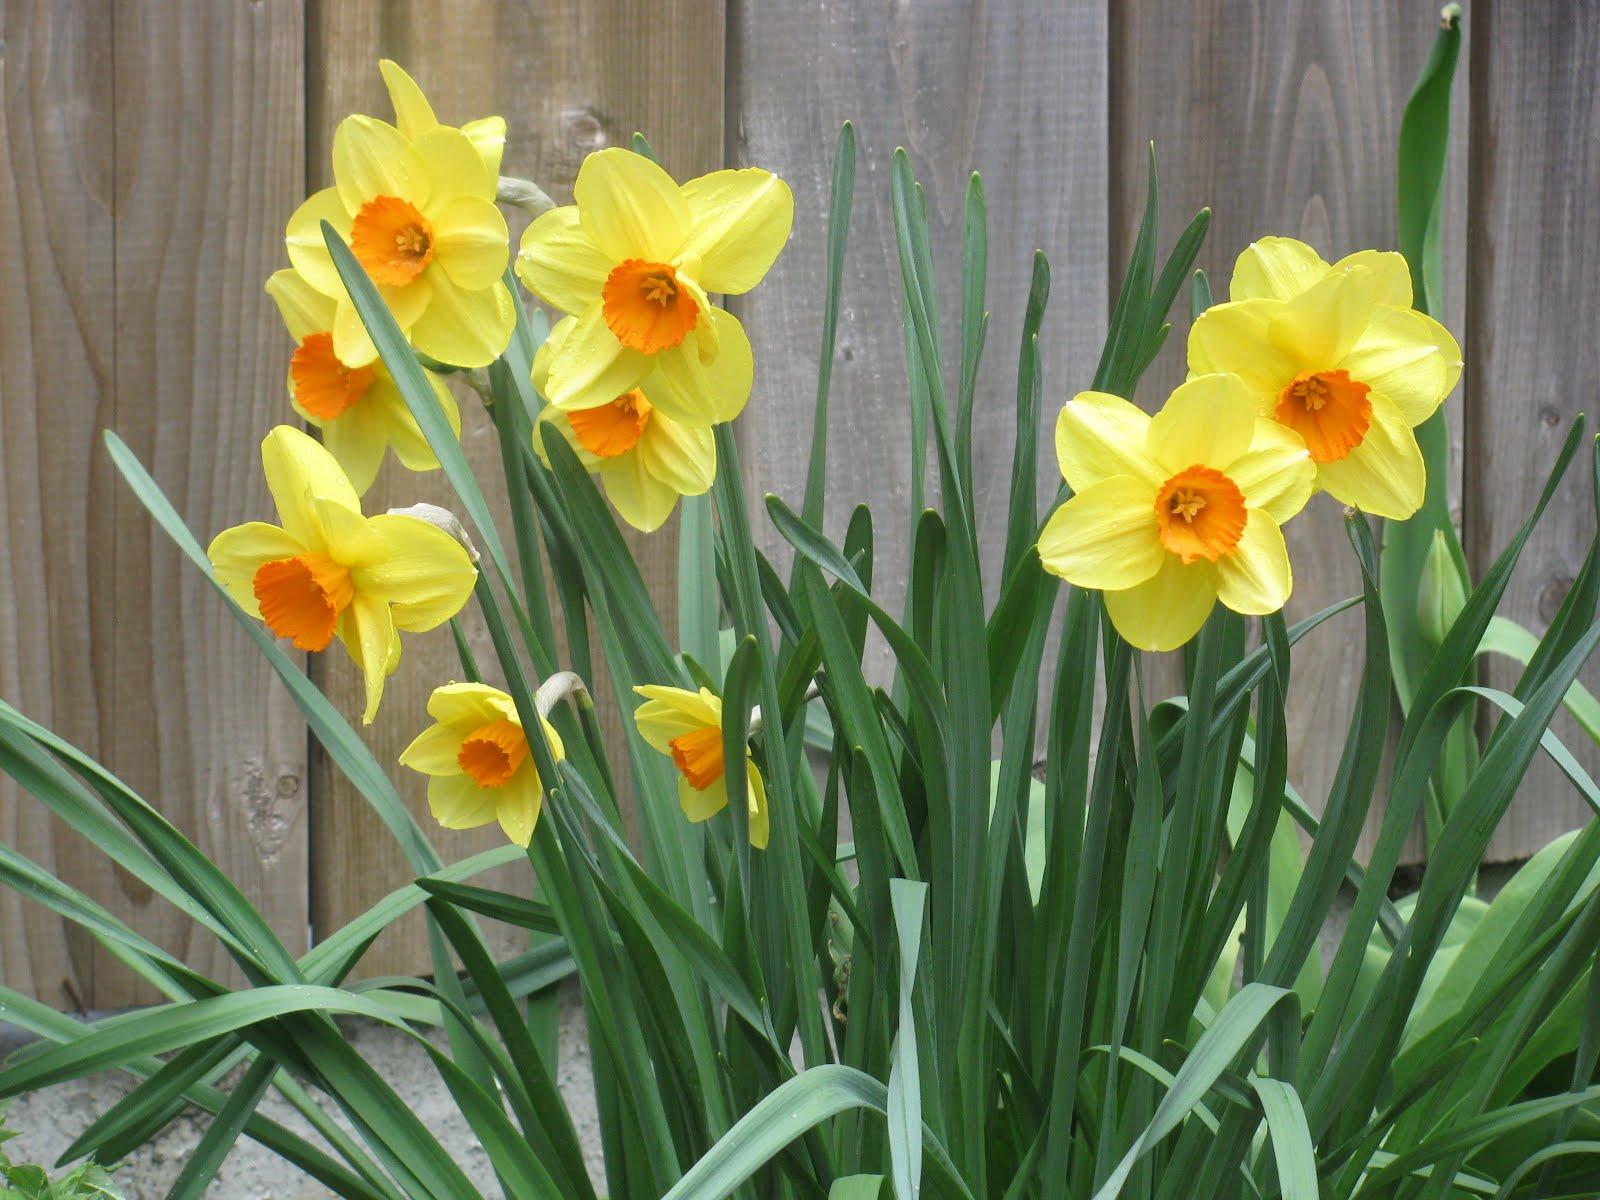 daffodil - photo #24